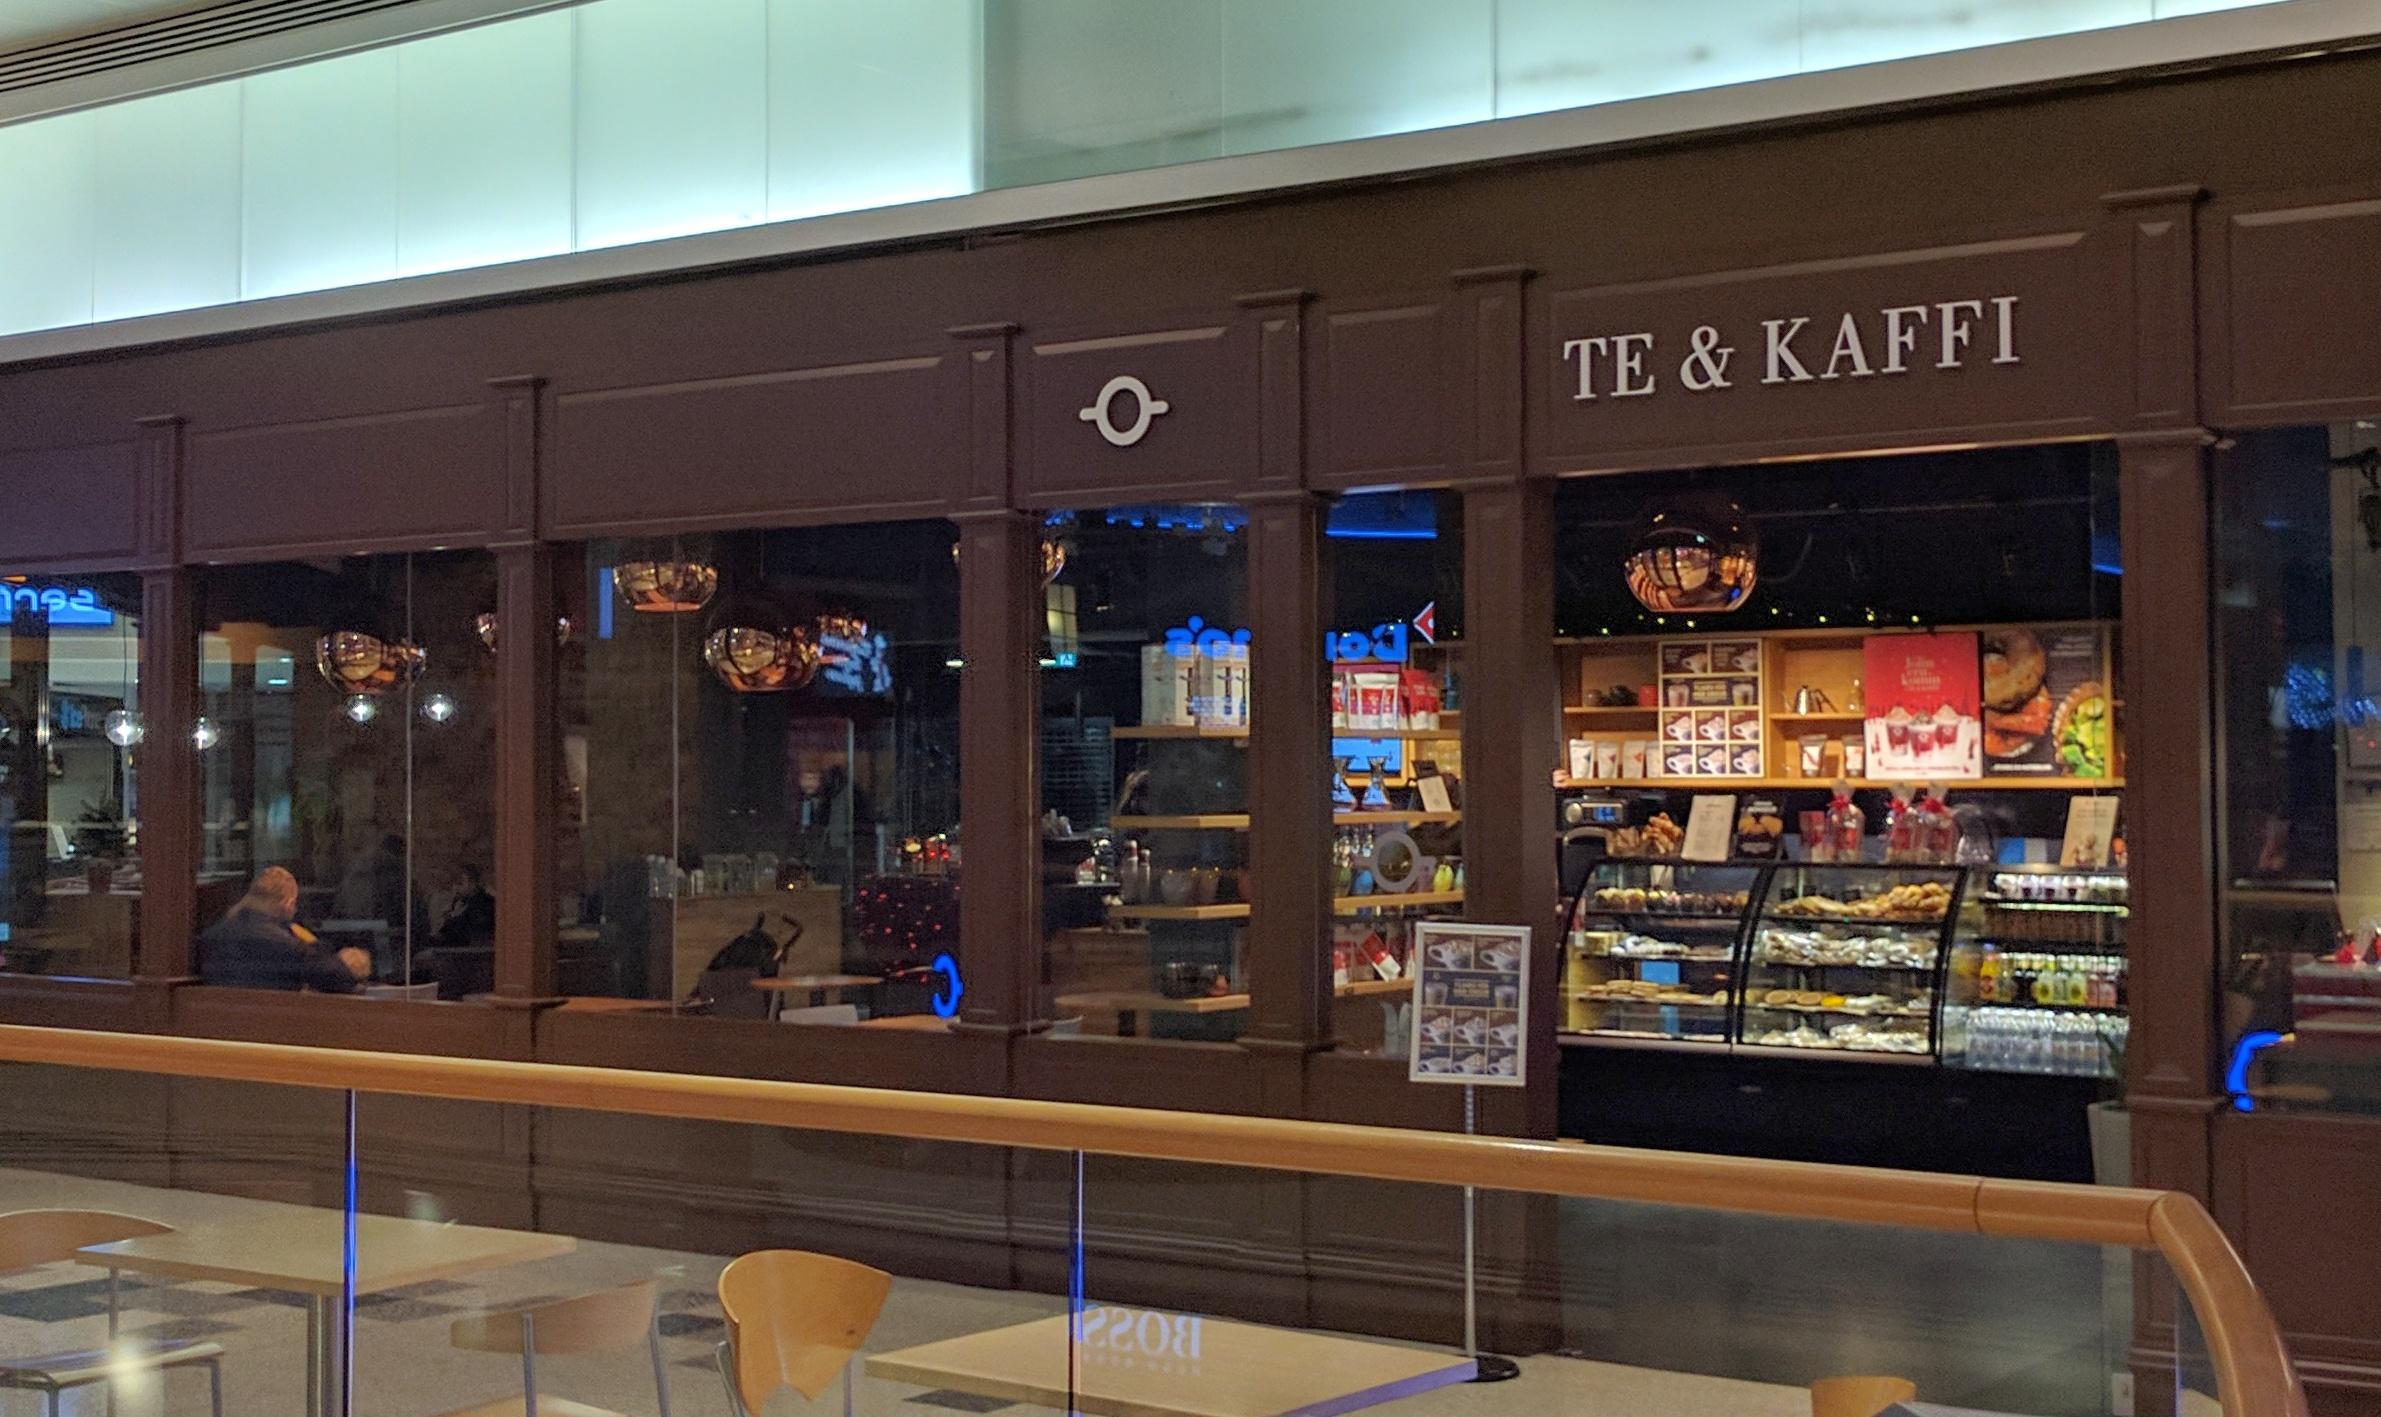 Te & Kaffi Kringlan Mall Exterior